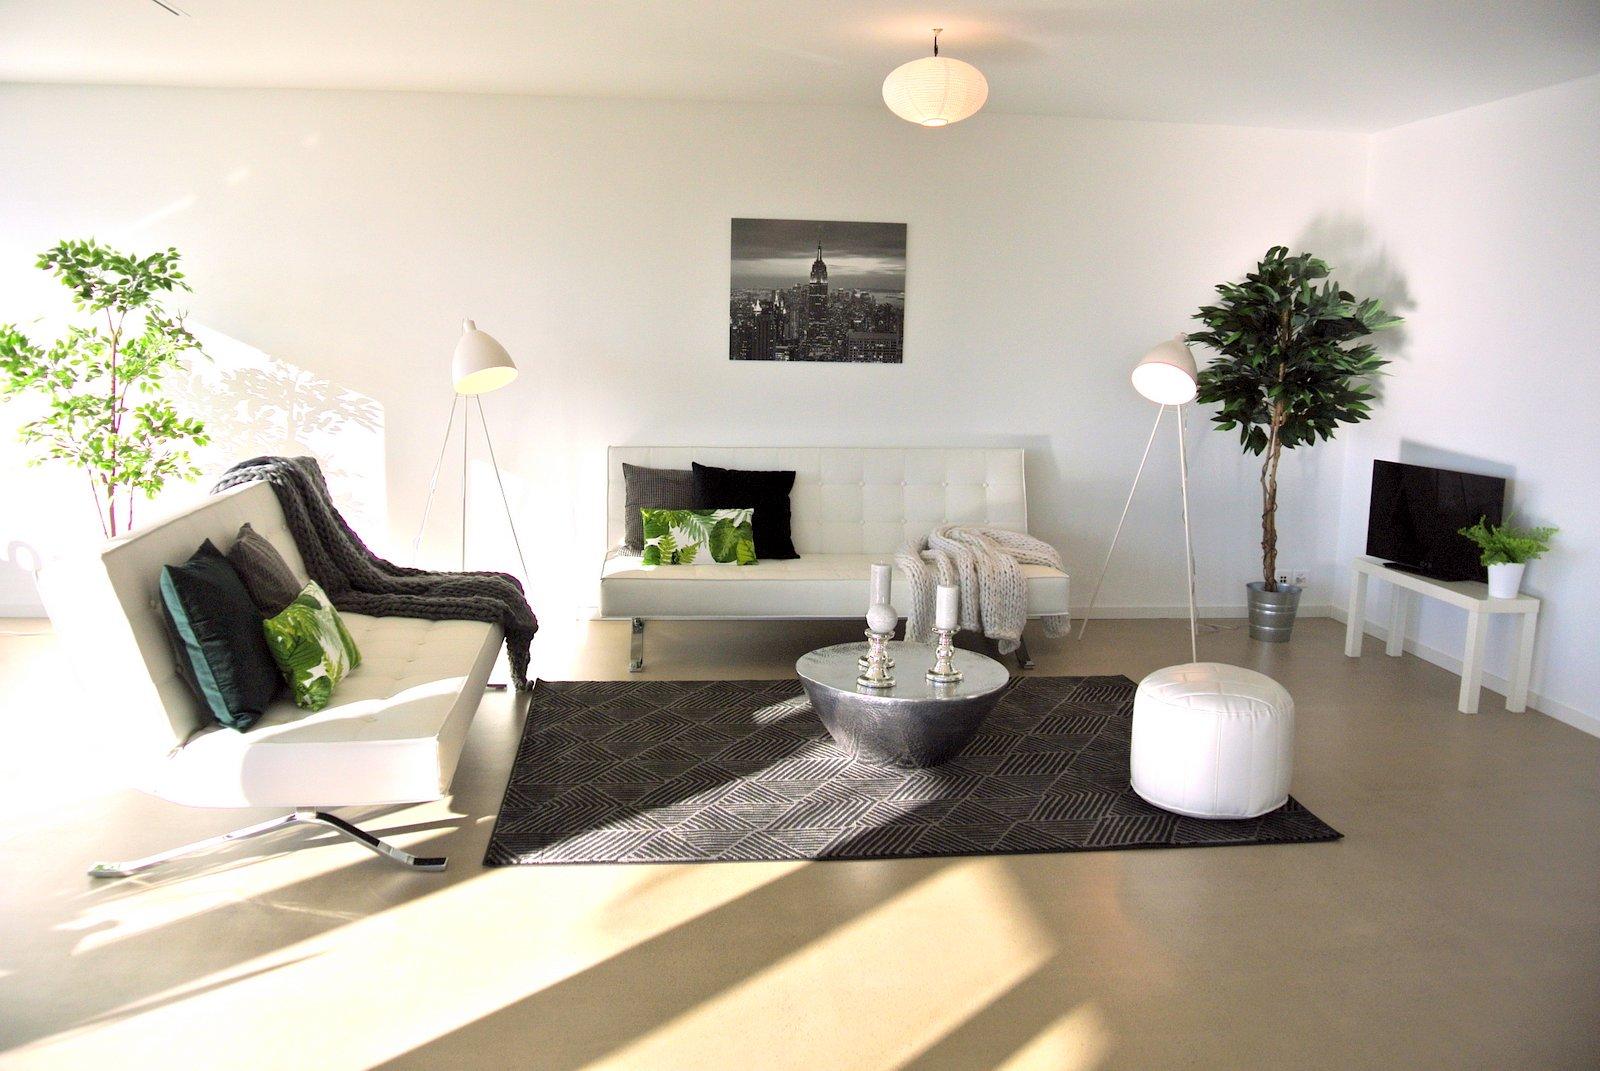 switzerland iahsp europe. Black Bedroom Furniture Sets. Home Design Ideas